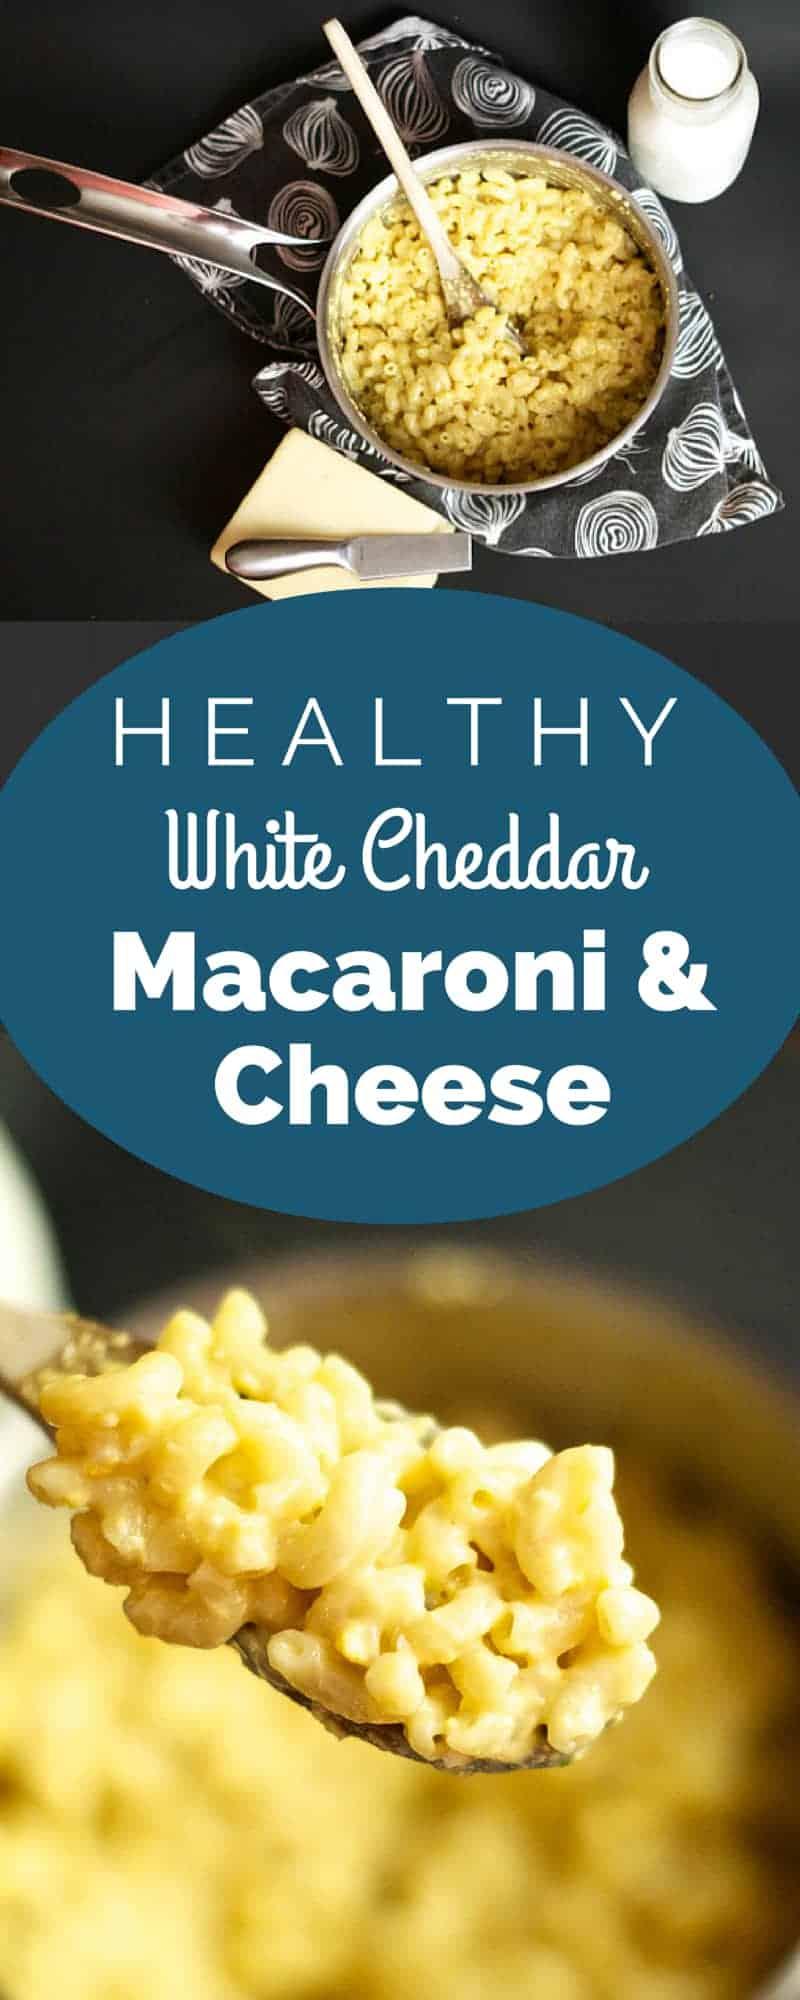 White Cheddar Macaroni And Cheese Recipe: White Cheddar Mac N Cheese